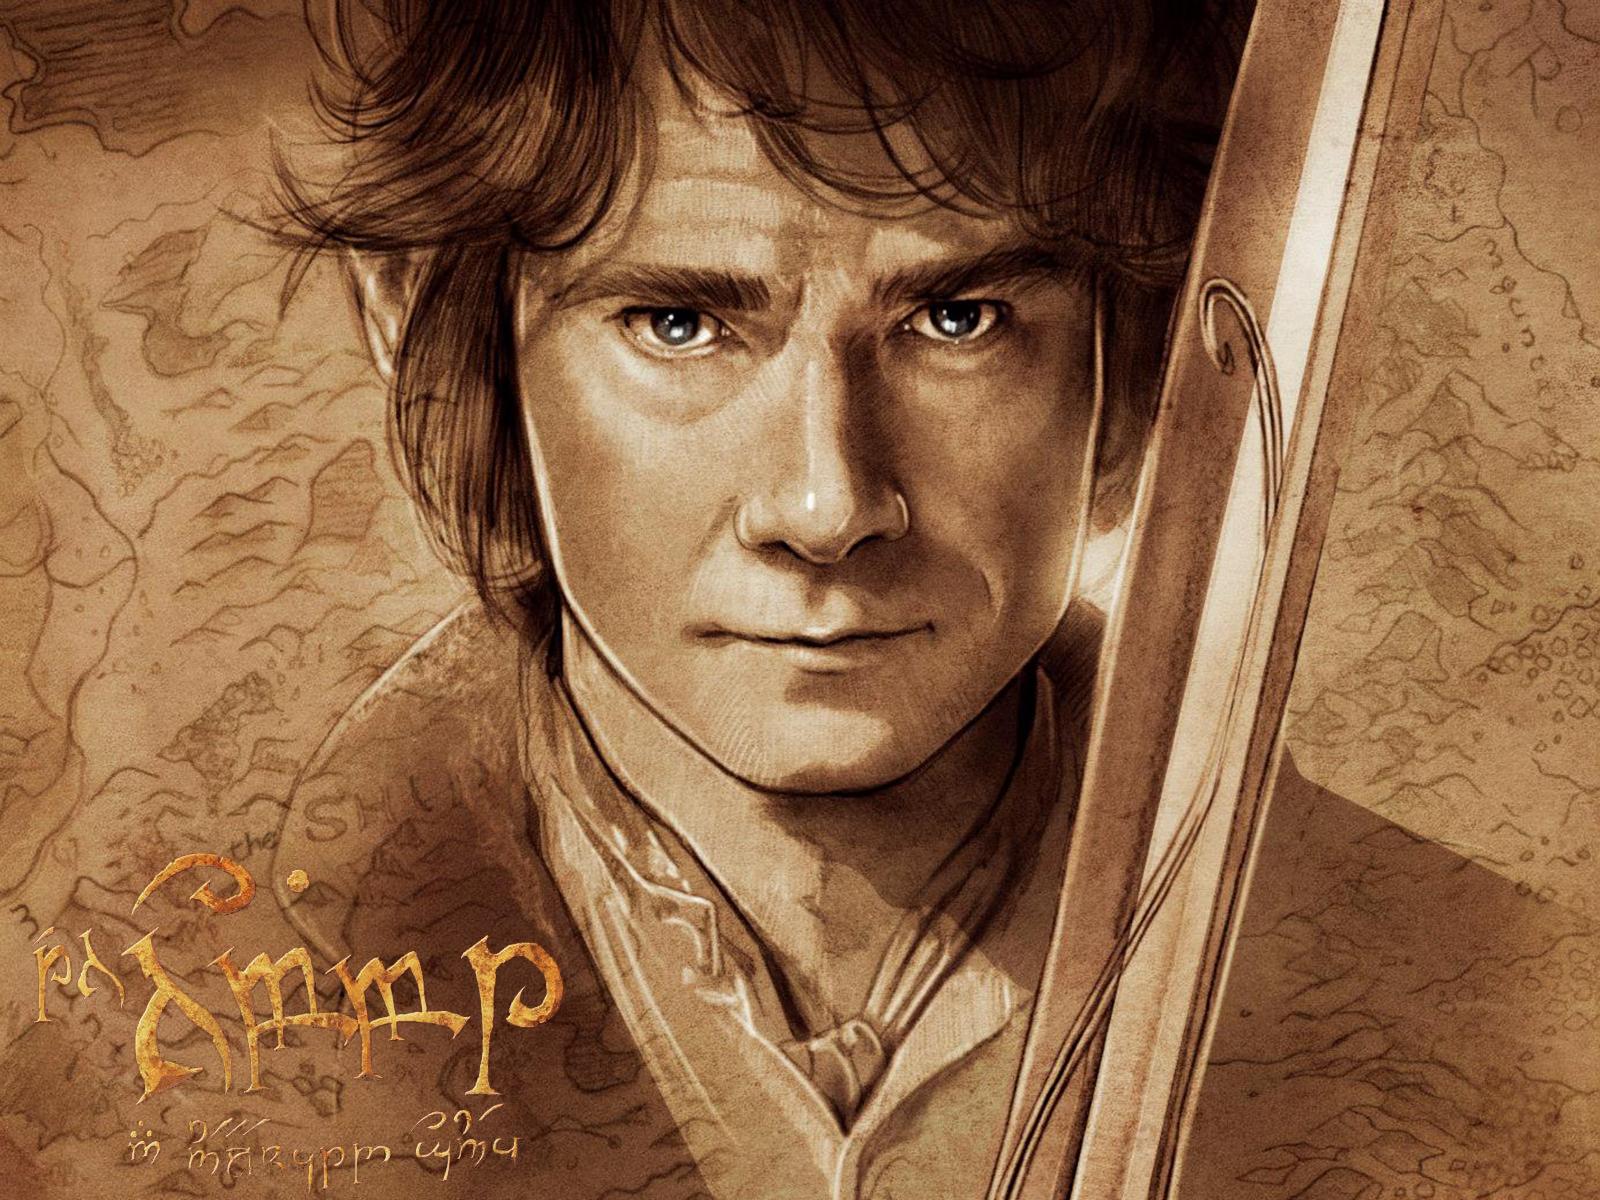 7G1 'S BLOG CUZ' WE ARE THE BEST: The Hobbit